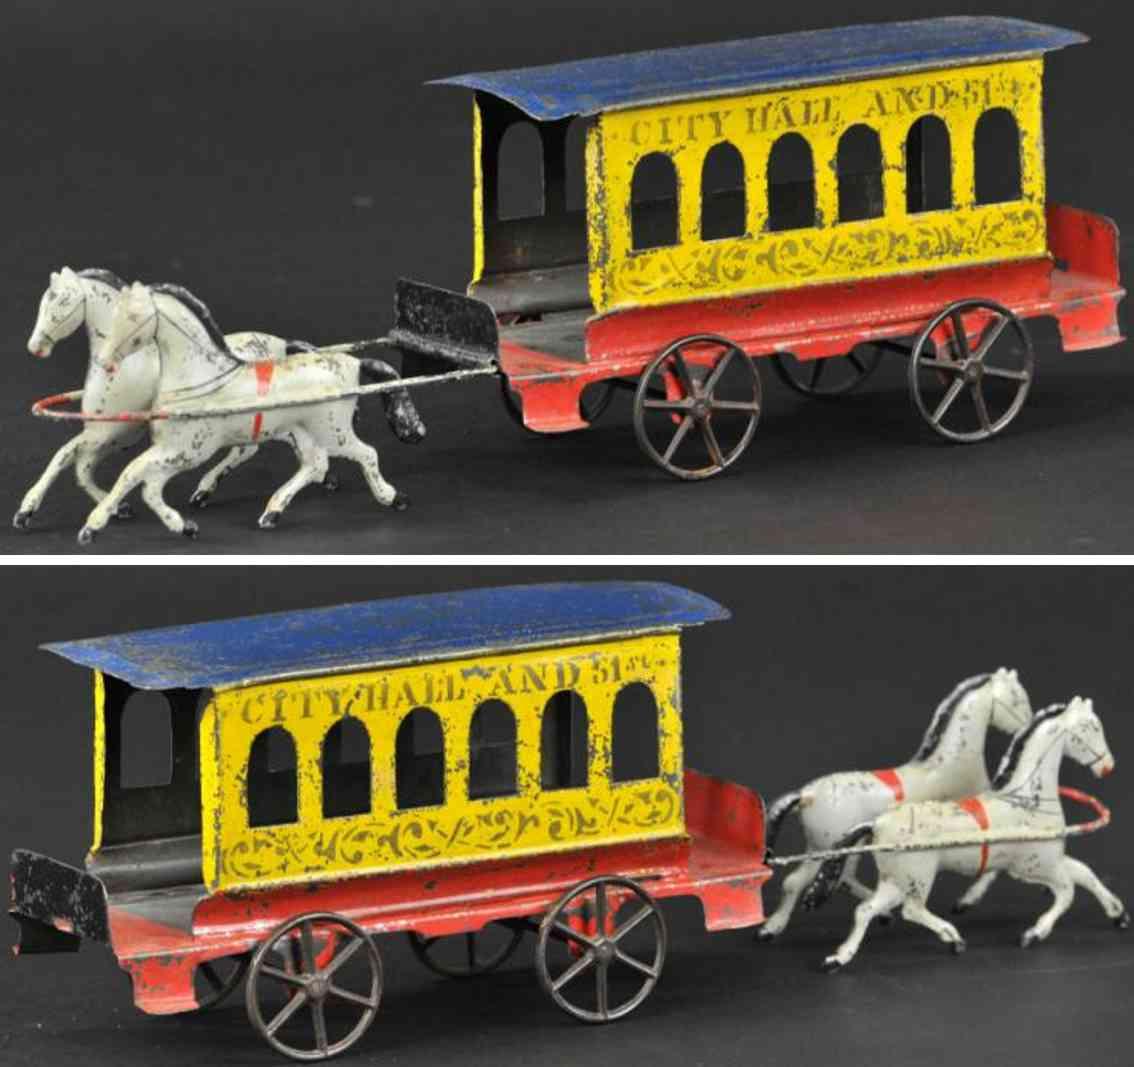 fallows tin toy city hall trolley two white horses